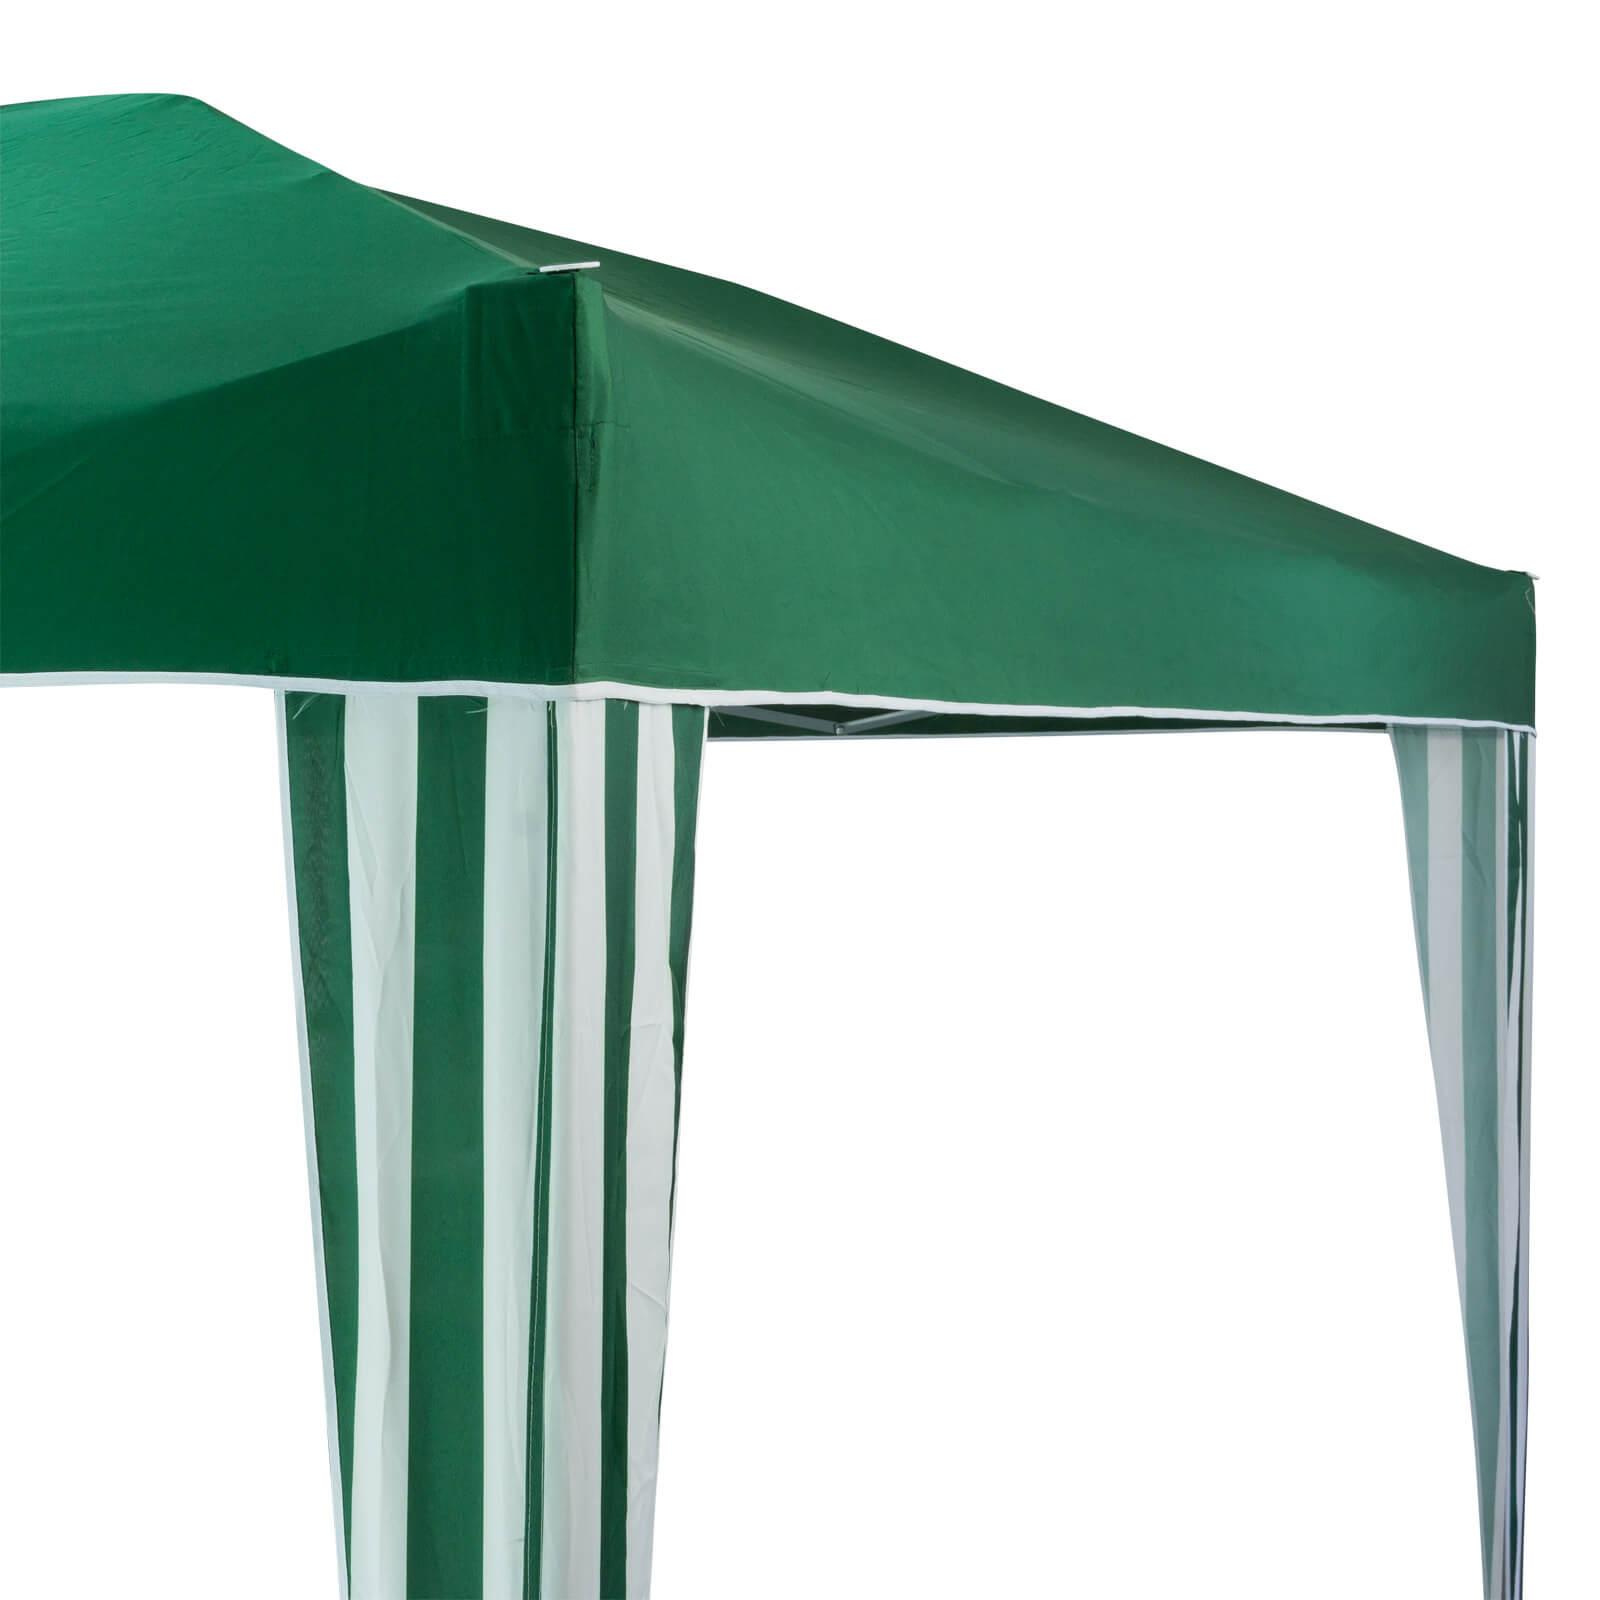 gartenpavillon faltpavillon alu metall 3x3 meter gr n. Black Bedroom Furniture Sets. Home Design Ideas